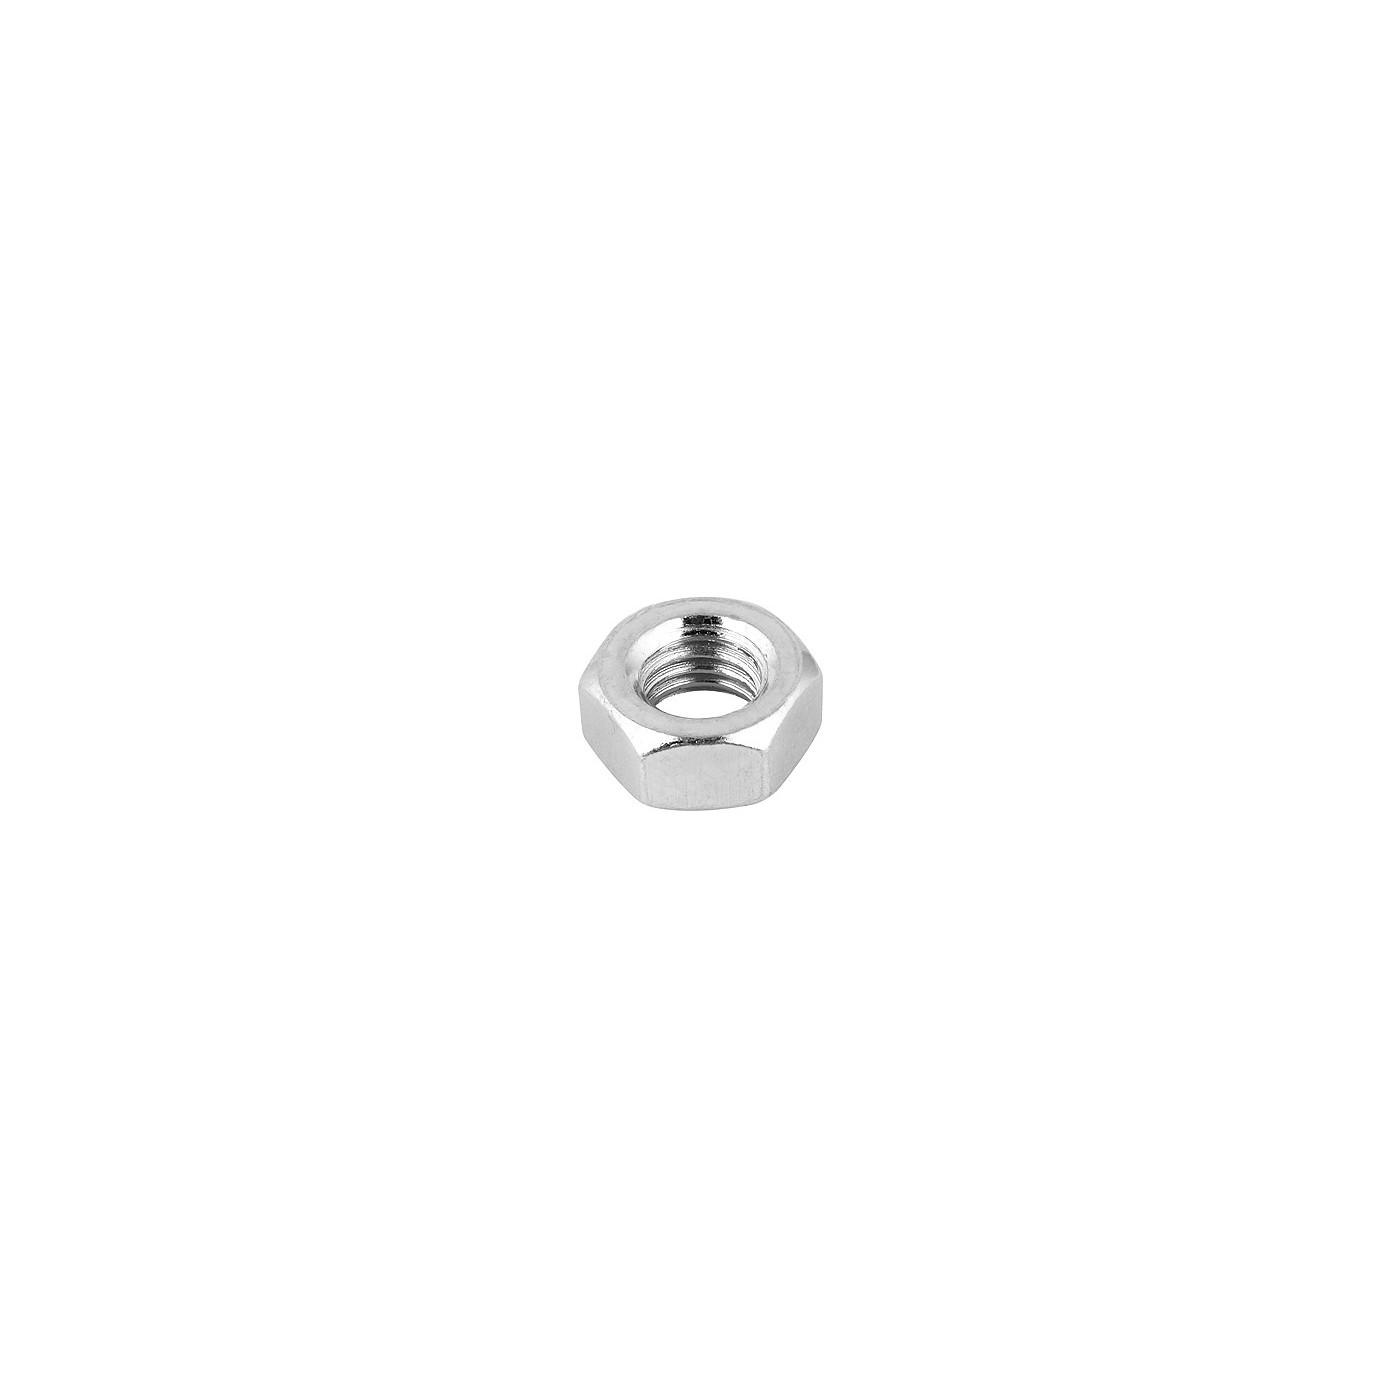 Set of 40 hexagon nuts (M6, galvanized steel, DIN 934)